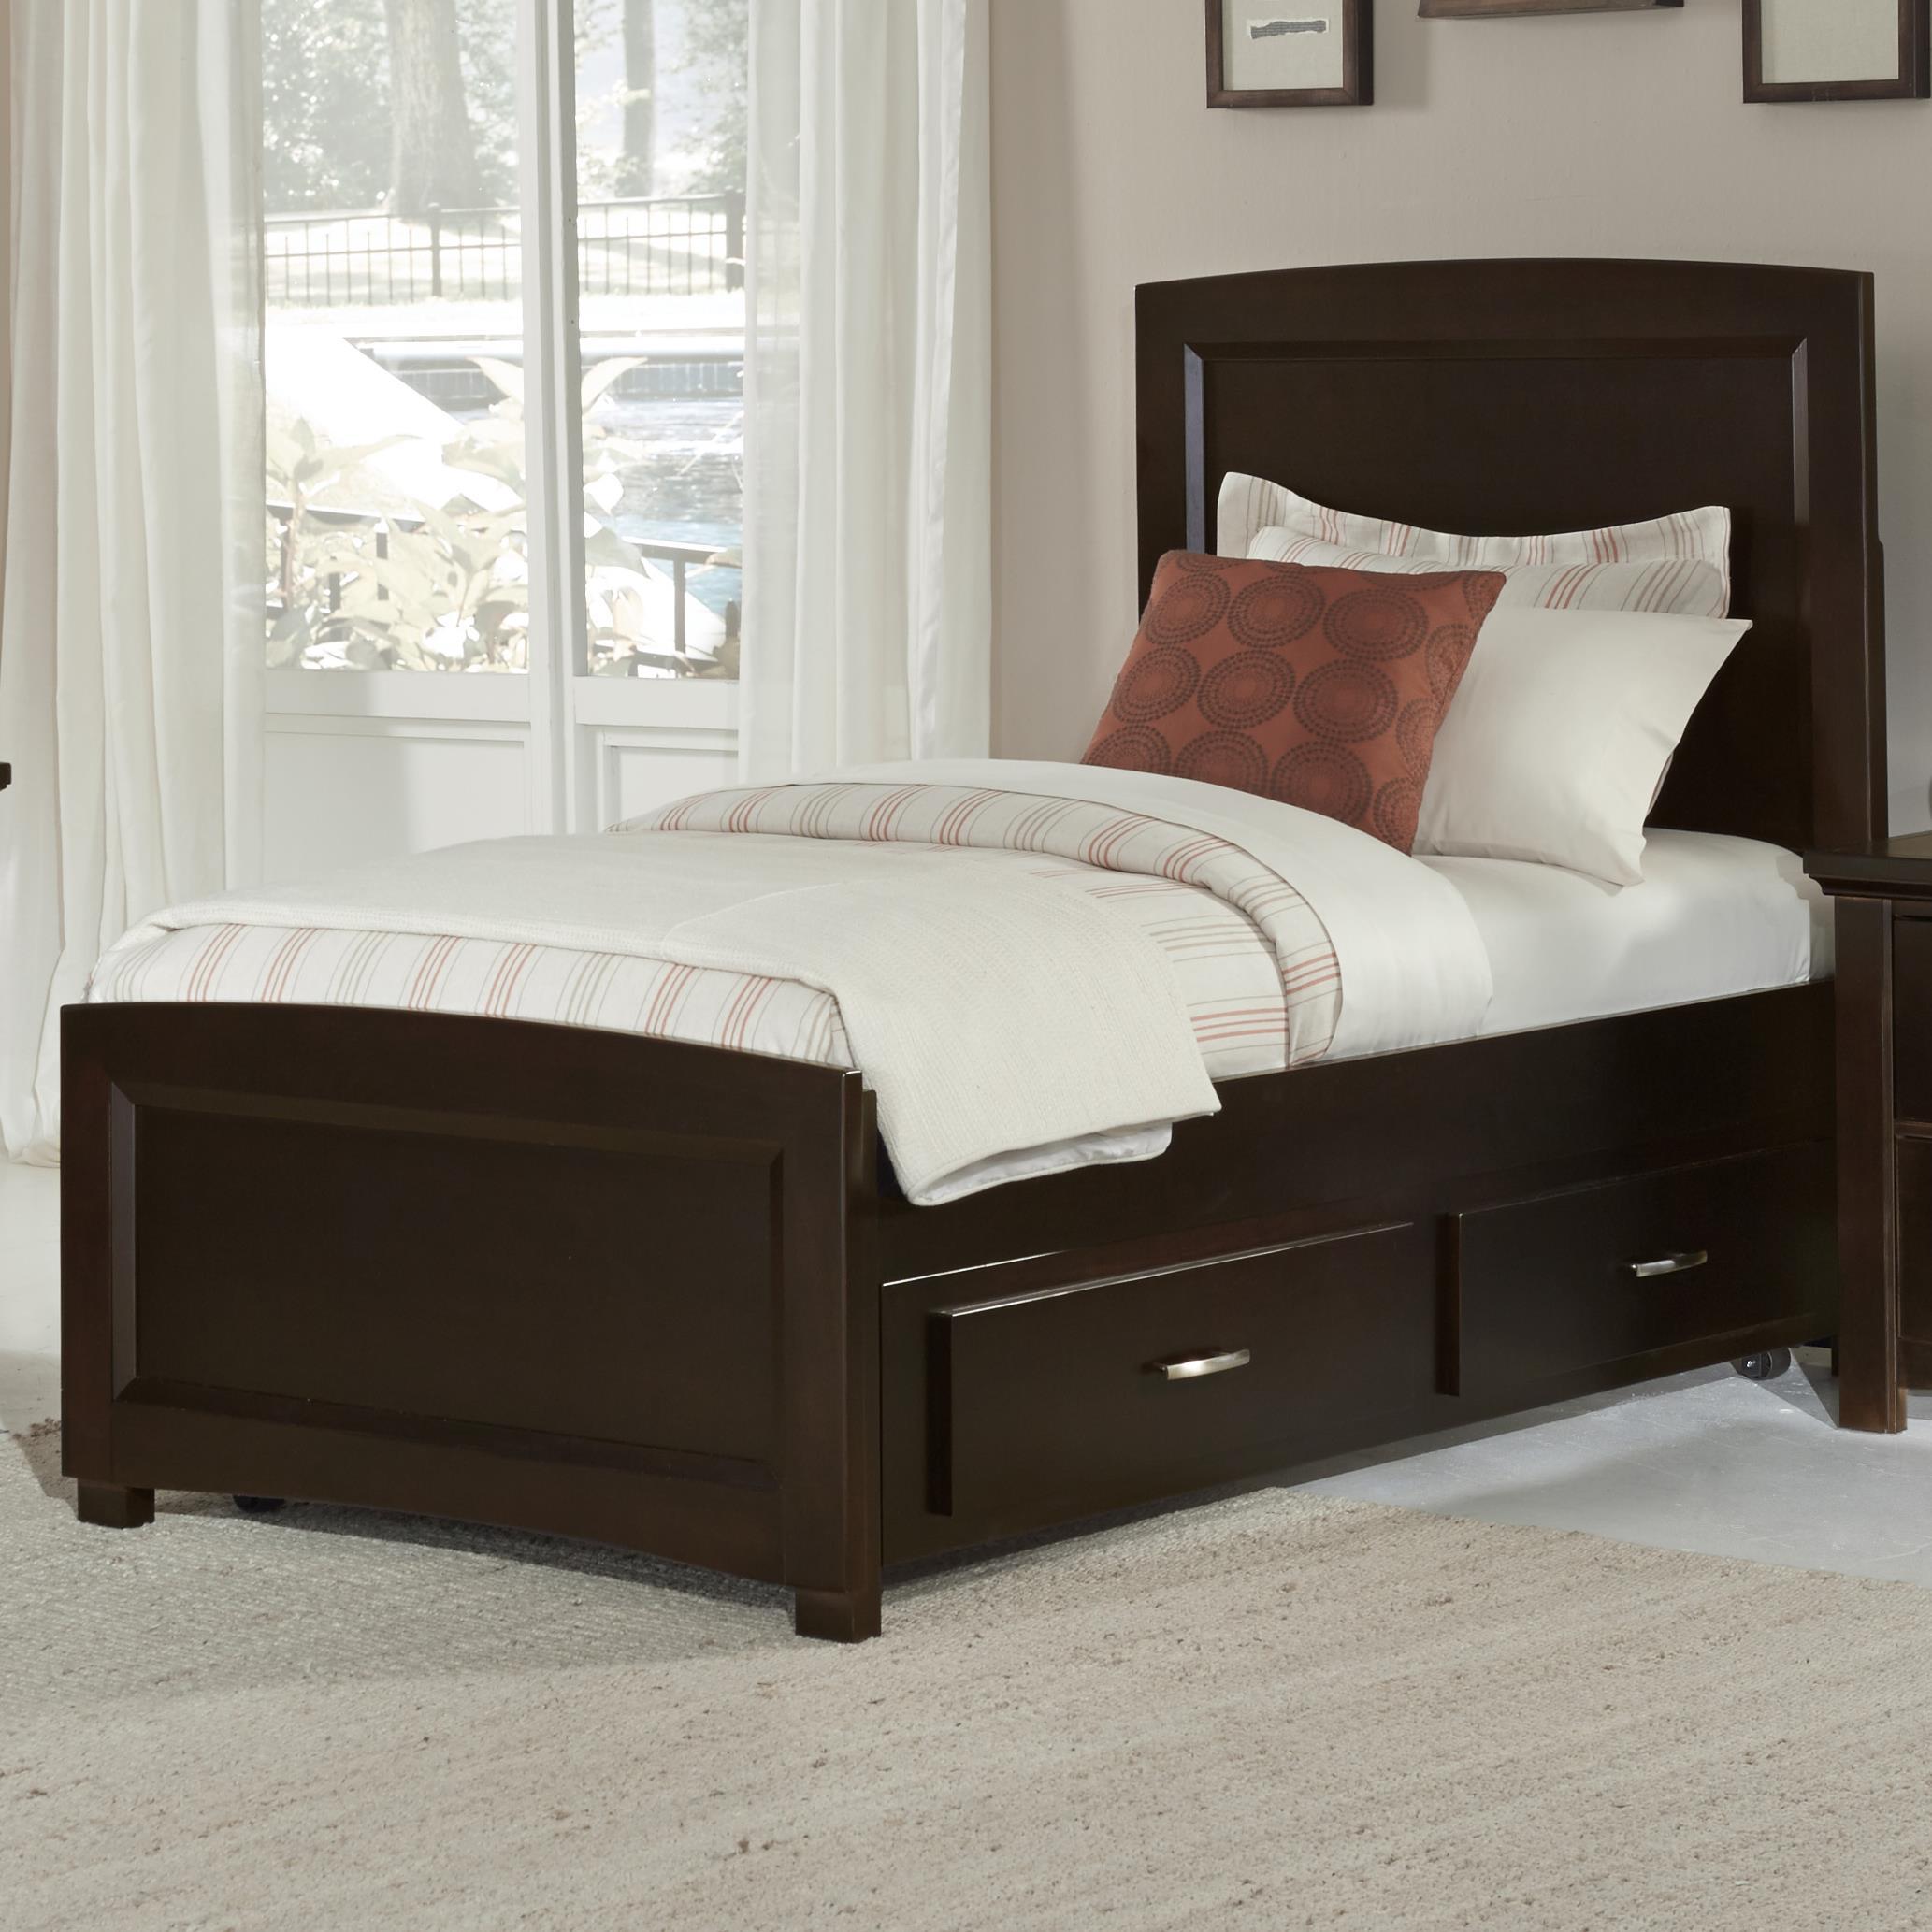 vaughan bassett transitions twin panel bed with trundle becker furniture world platform beds. Black Bedroom Furniture Sets. Home Design Ideas